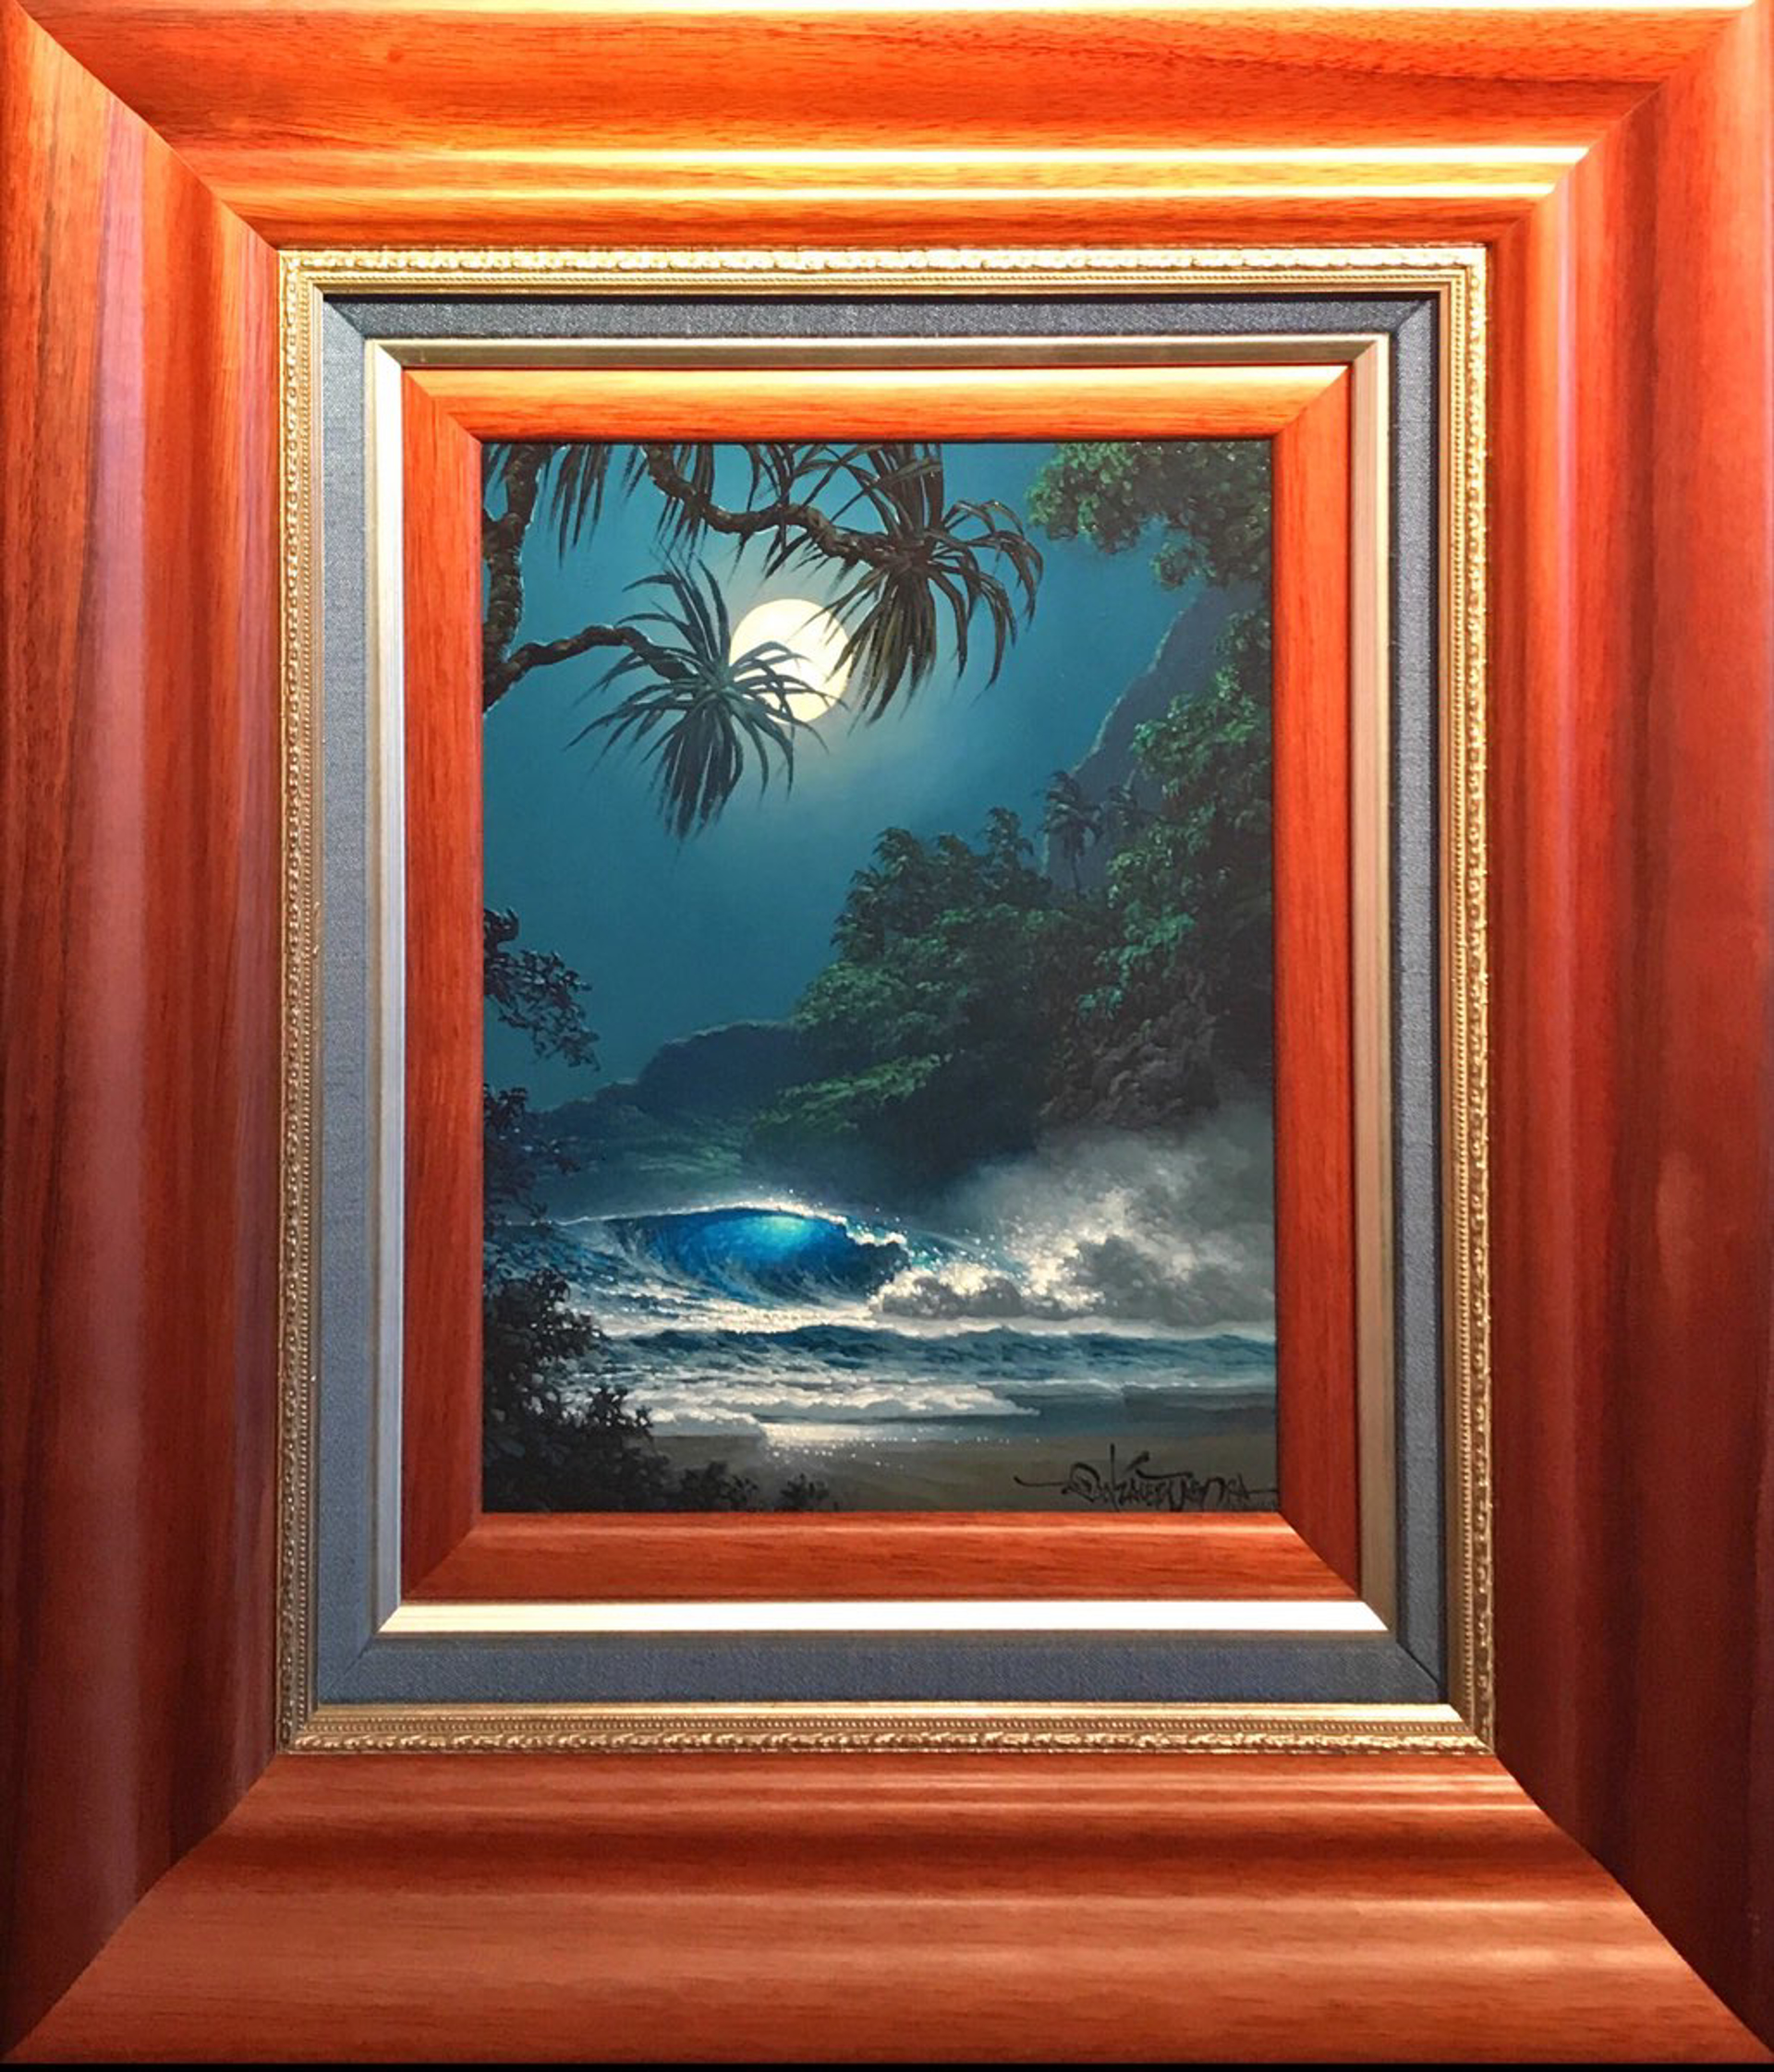 Midnight Magic by Roy Tabora